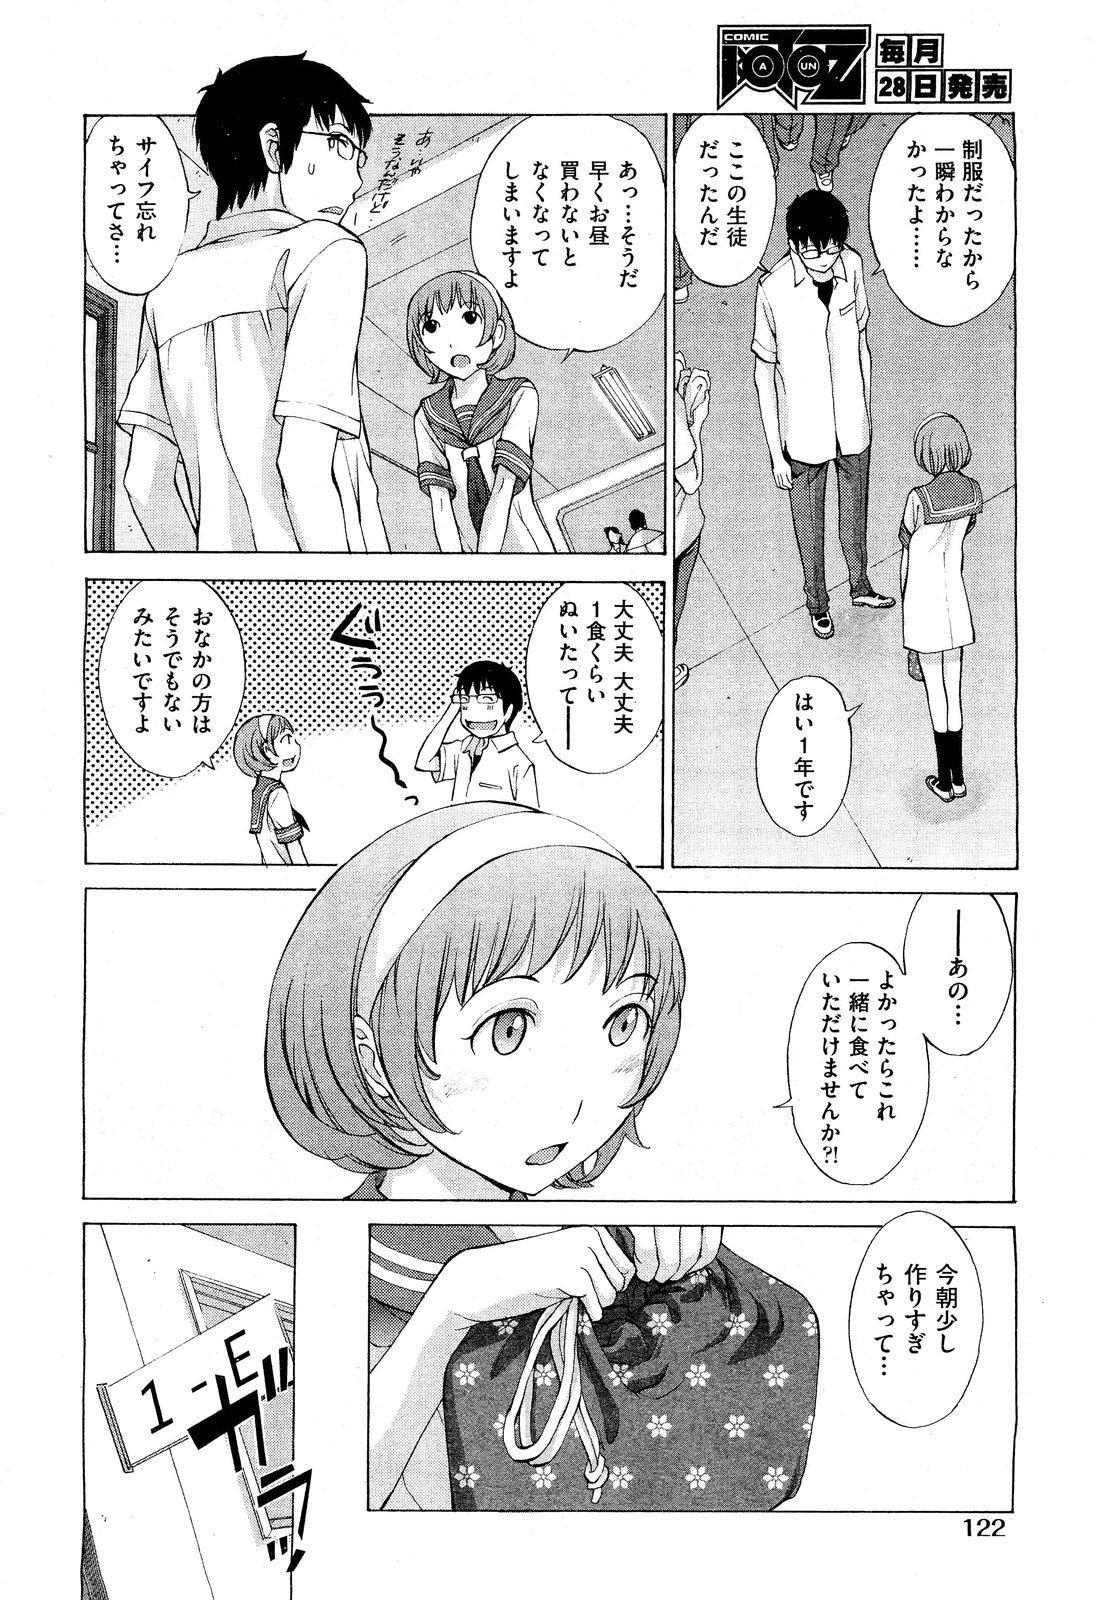 Hanazono 88